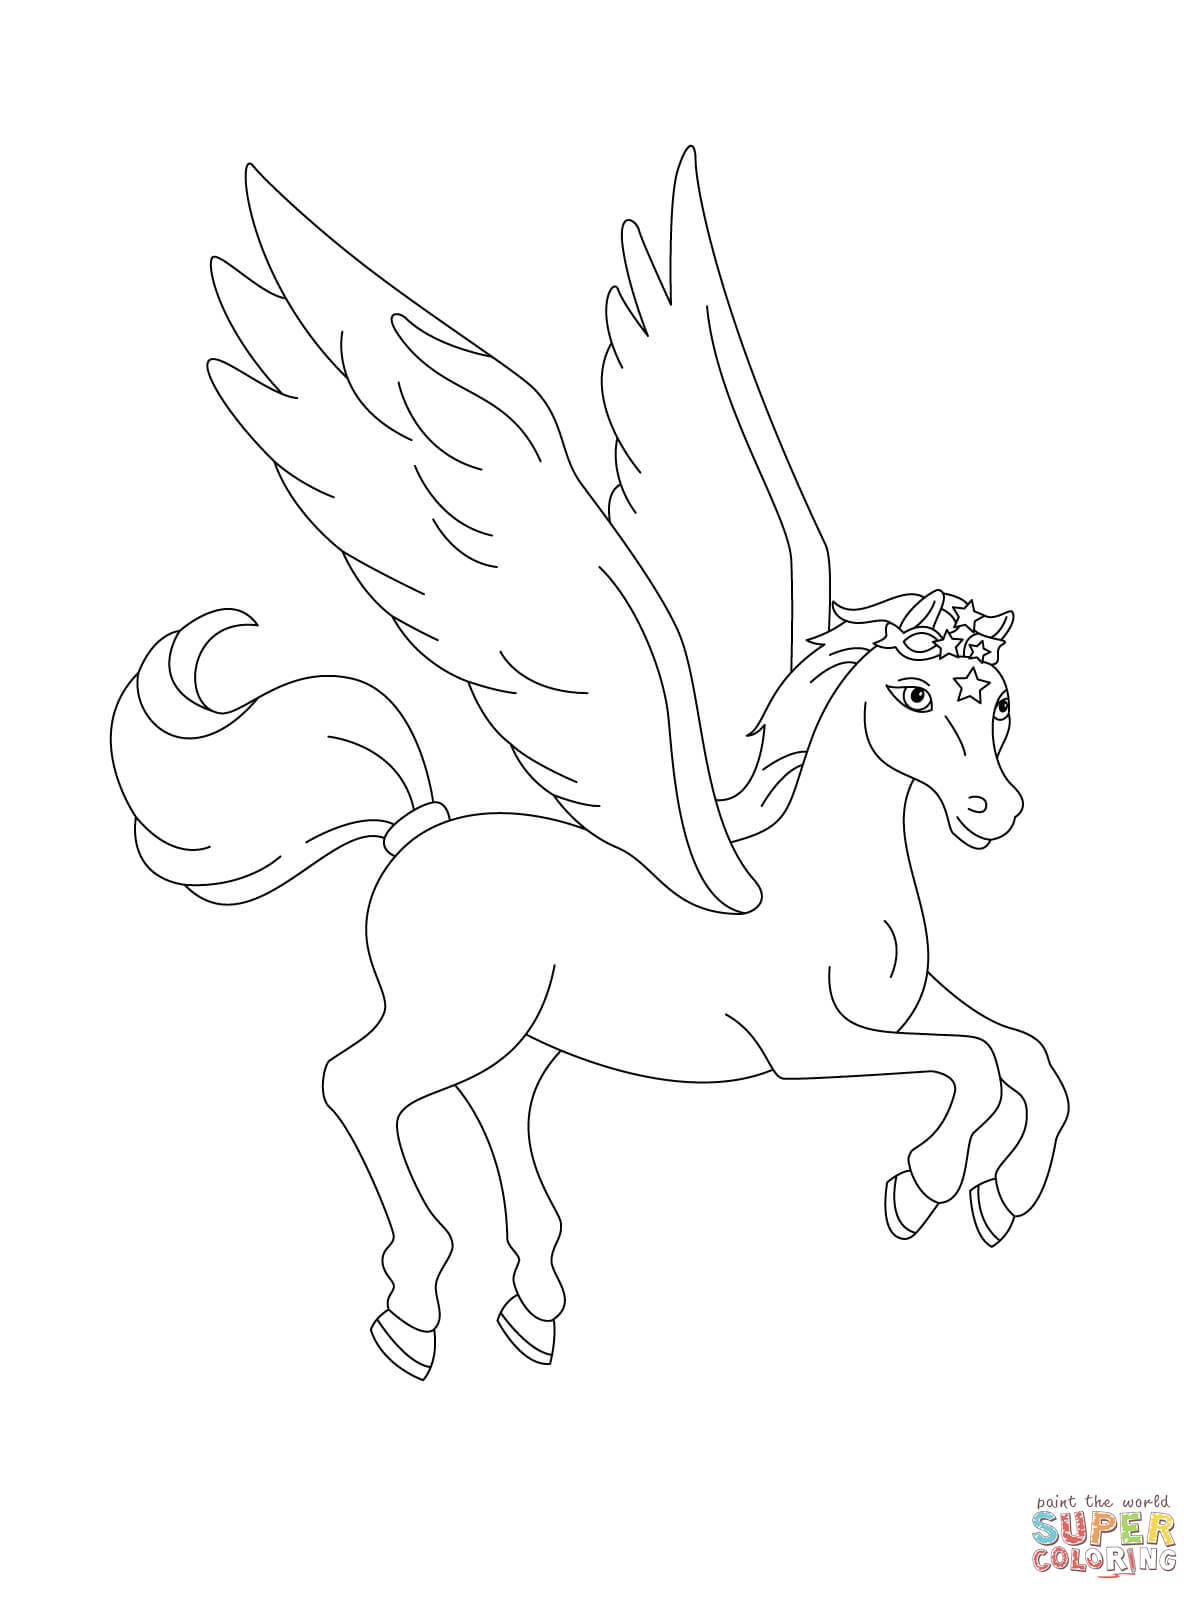 Klick das Bild Fliegender Pegasus